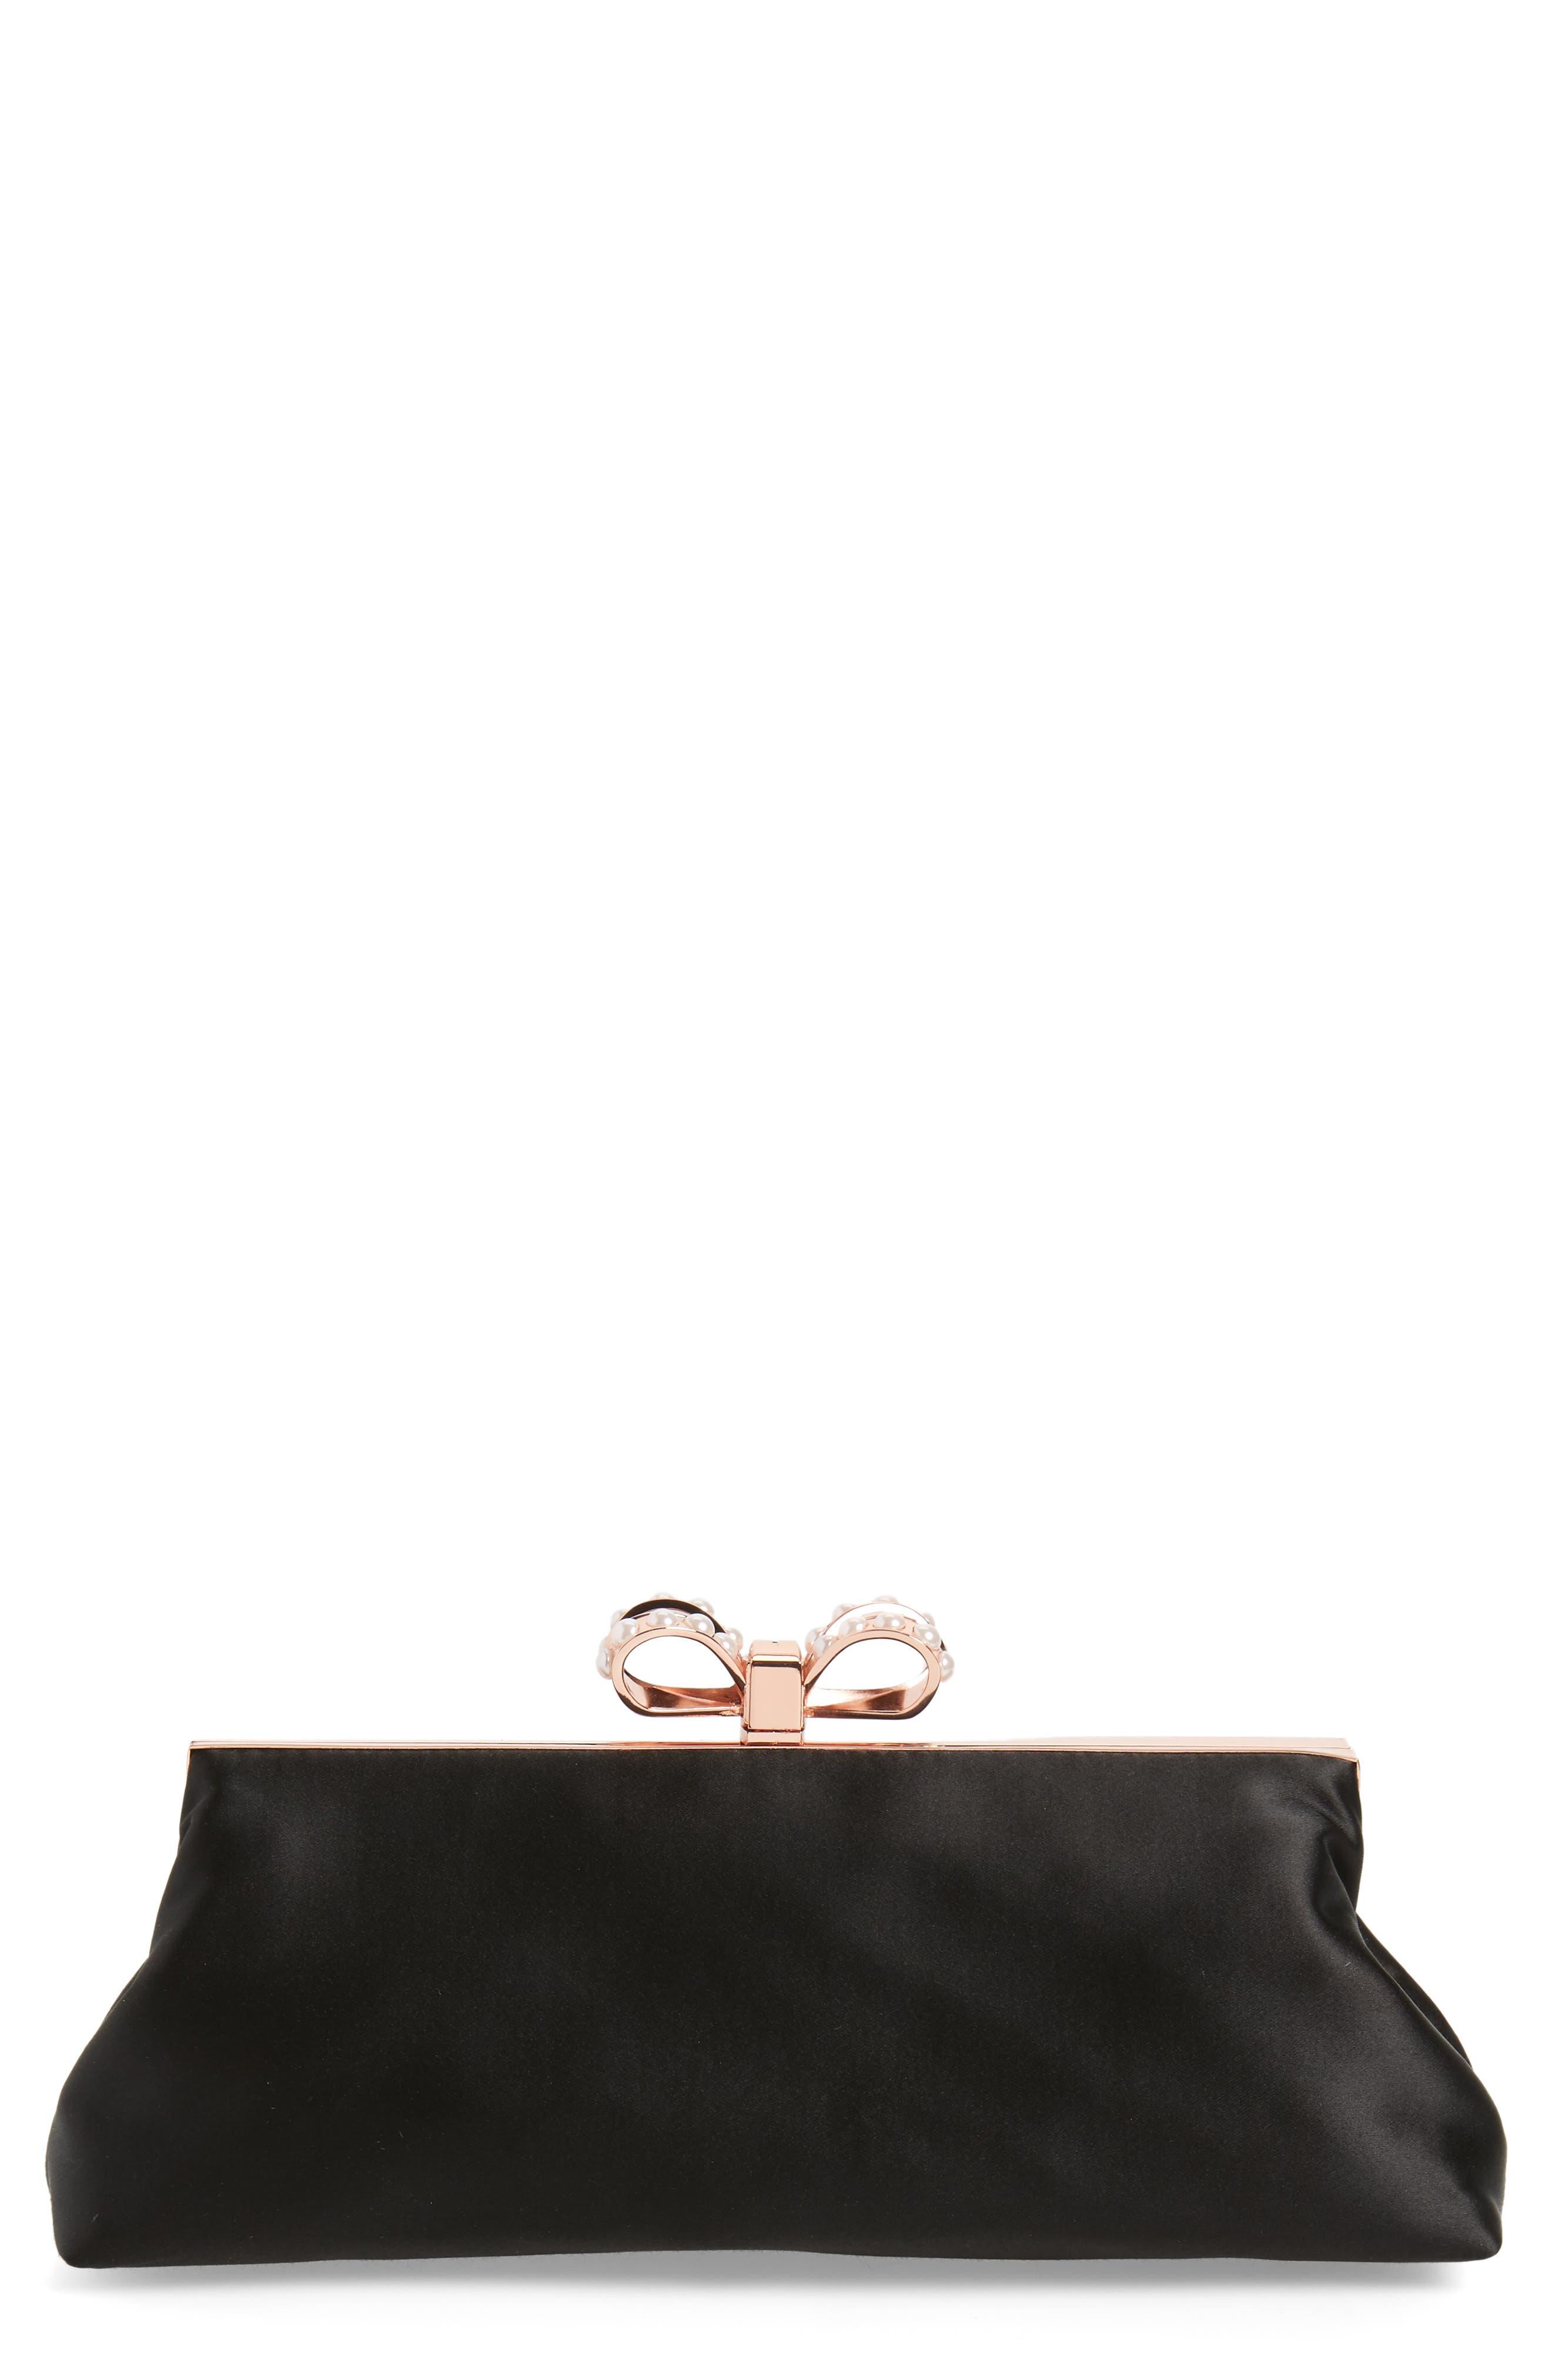 Georgaa Bow Clasp Evening Bag,                         Main,                         color, Black